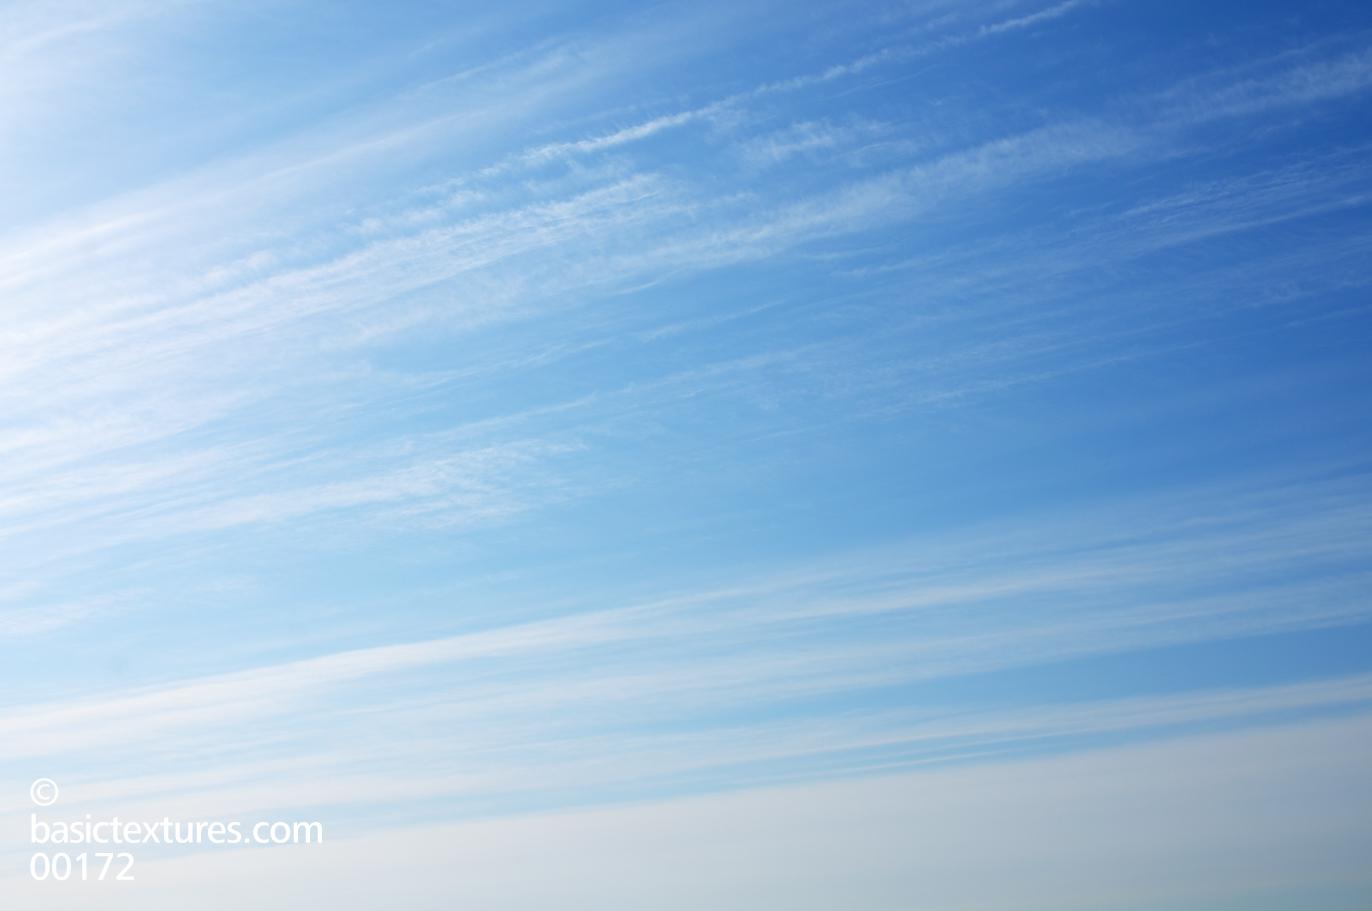 Sunny Sky Wallpaper Size 1372x911 AmazingPictcom   HD Wallpapers 1372x911